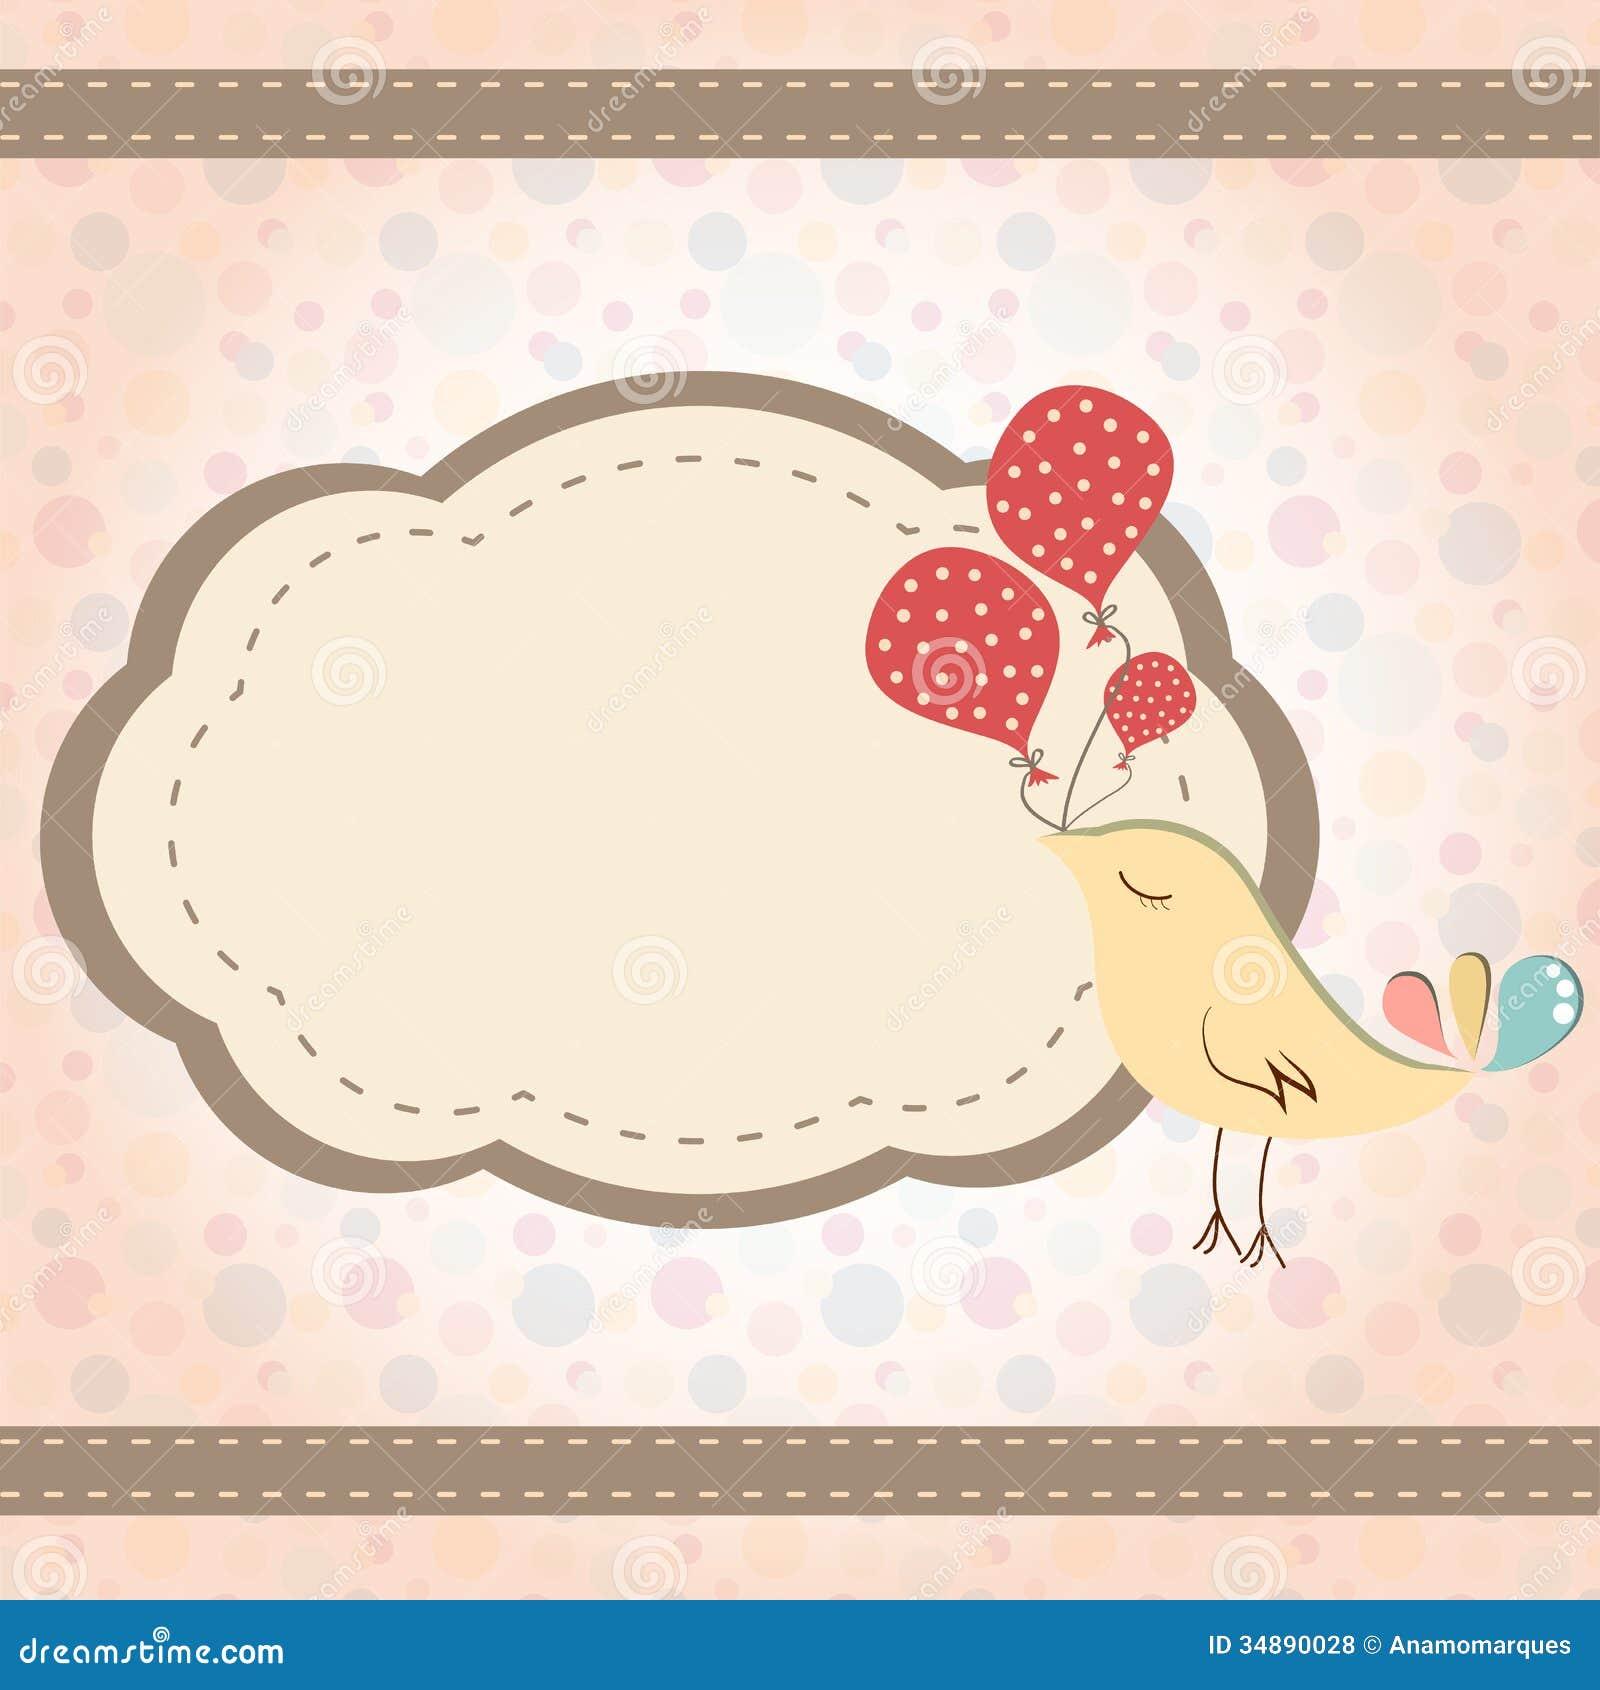 Love Birds Wedding Invitations were Fresh Layout To Make Inspirational Invitation Card